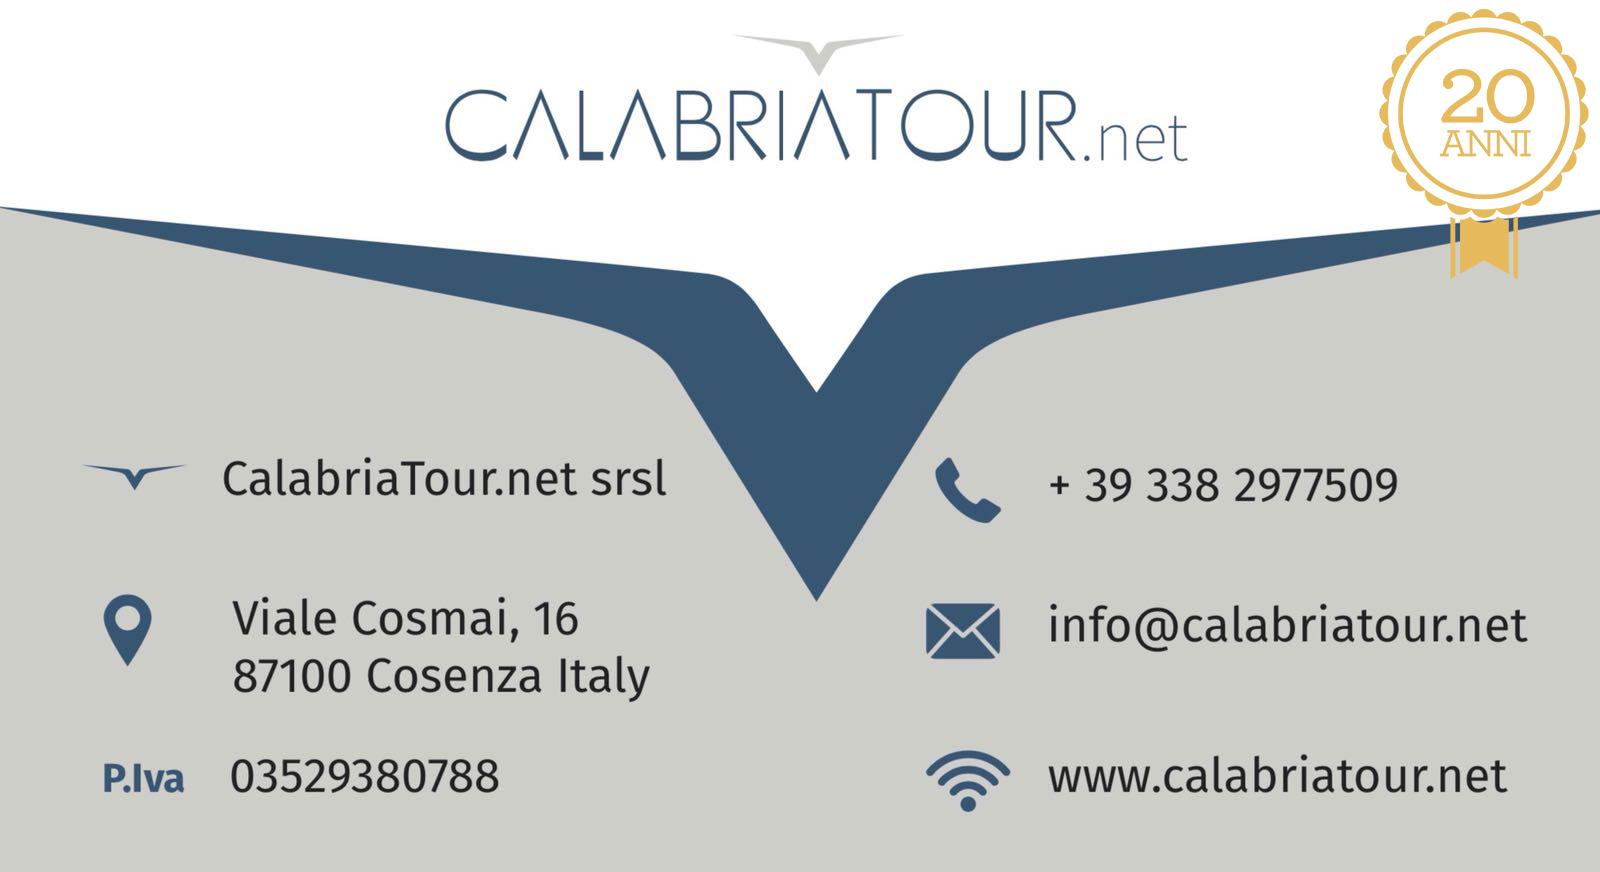 Calabriatour.net Srls